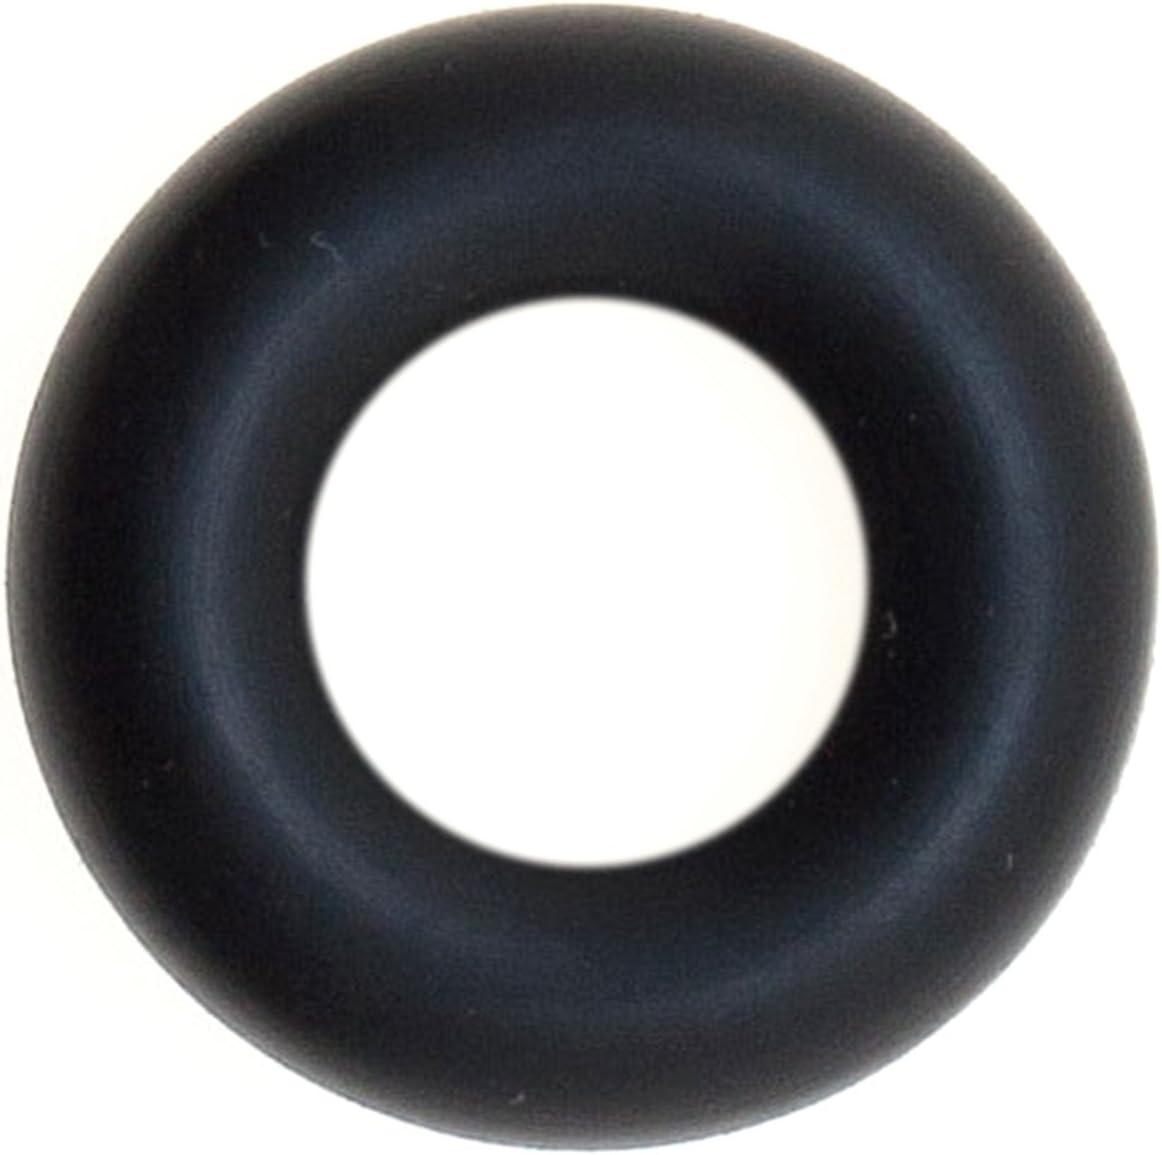 Menge 10 St/ück Dichtring//O-Ring 6 x 3 mm FKM 80 schwarz oder braun